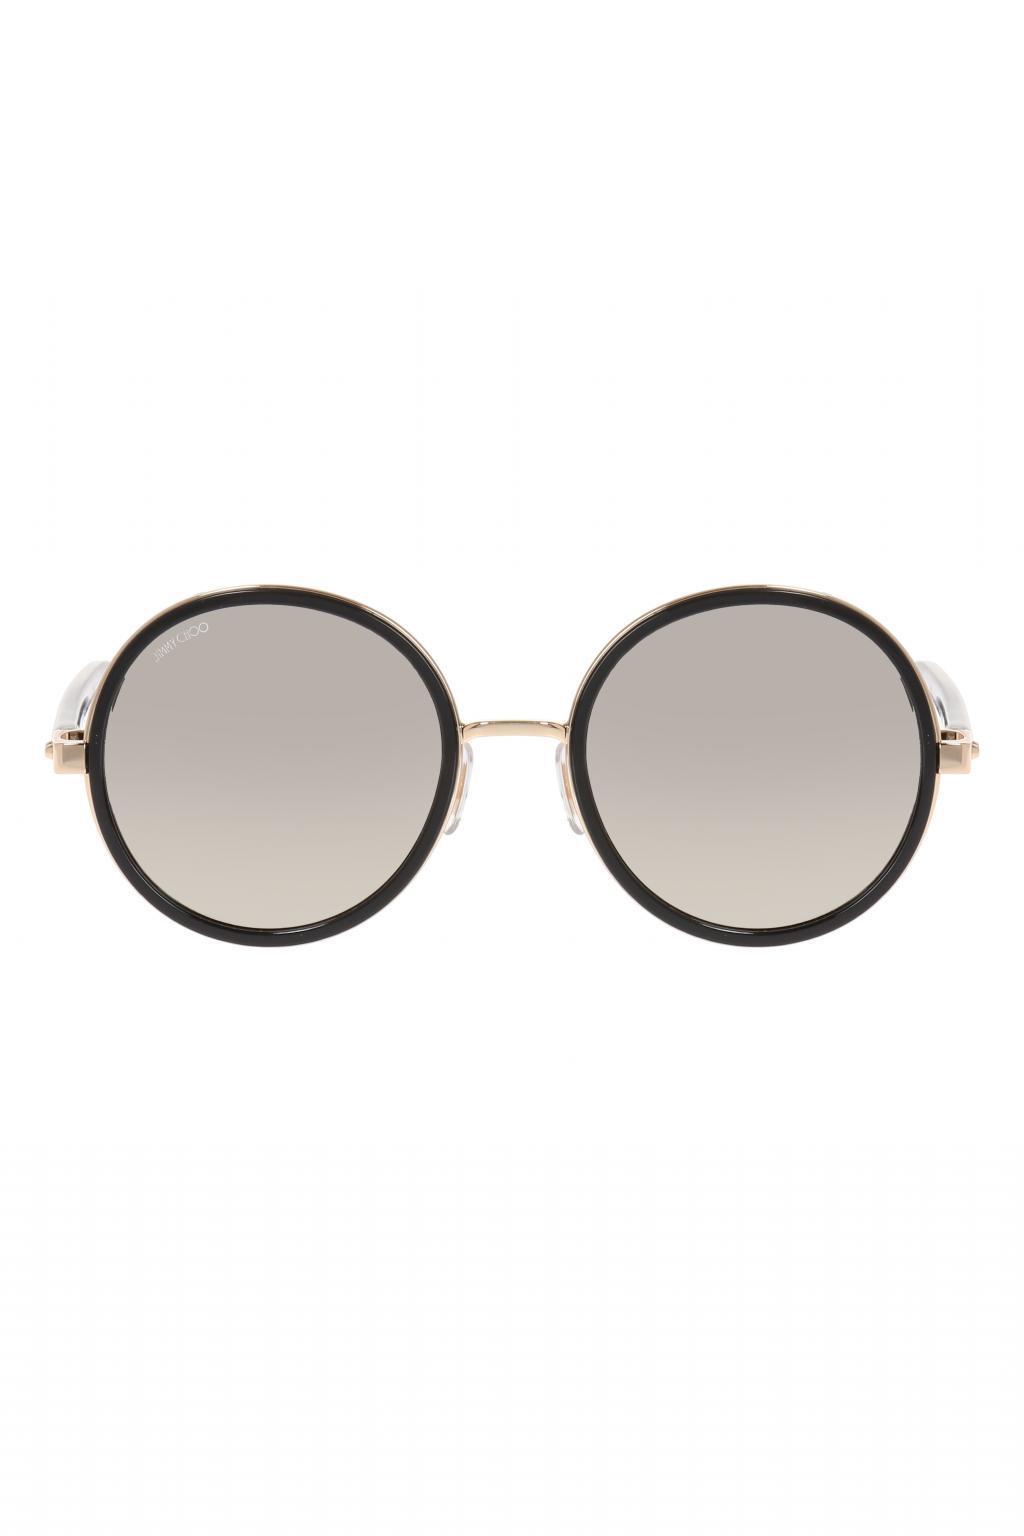 2965da8396  andie  Black Sunglasses Lyst Jimmy Choo In FwTxSEv